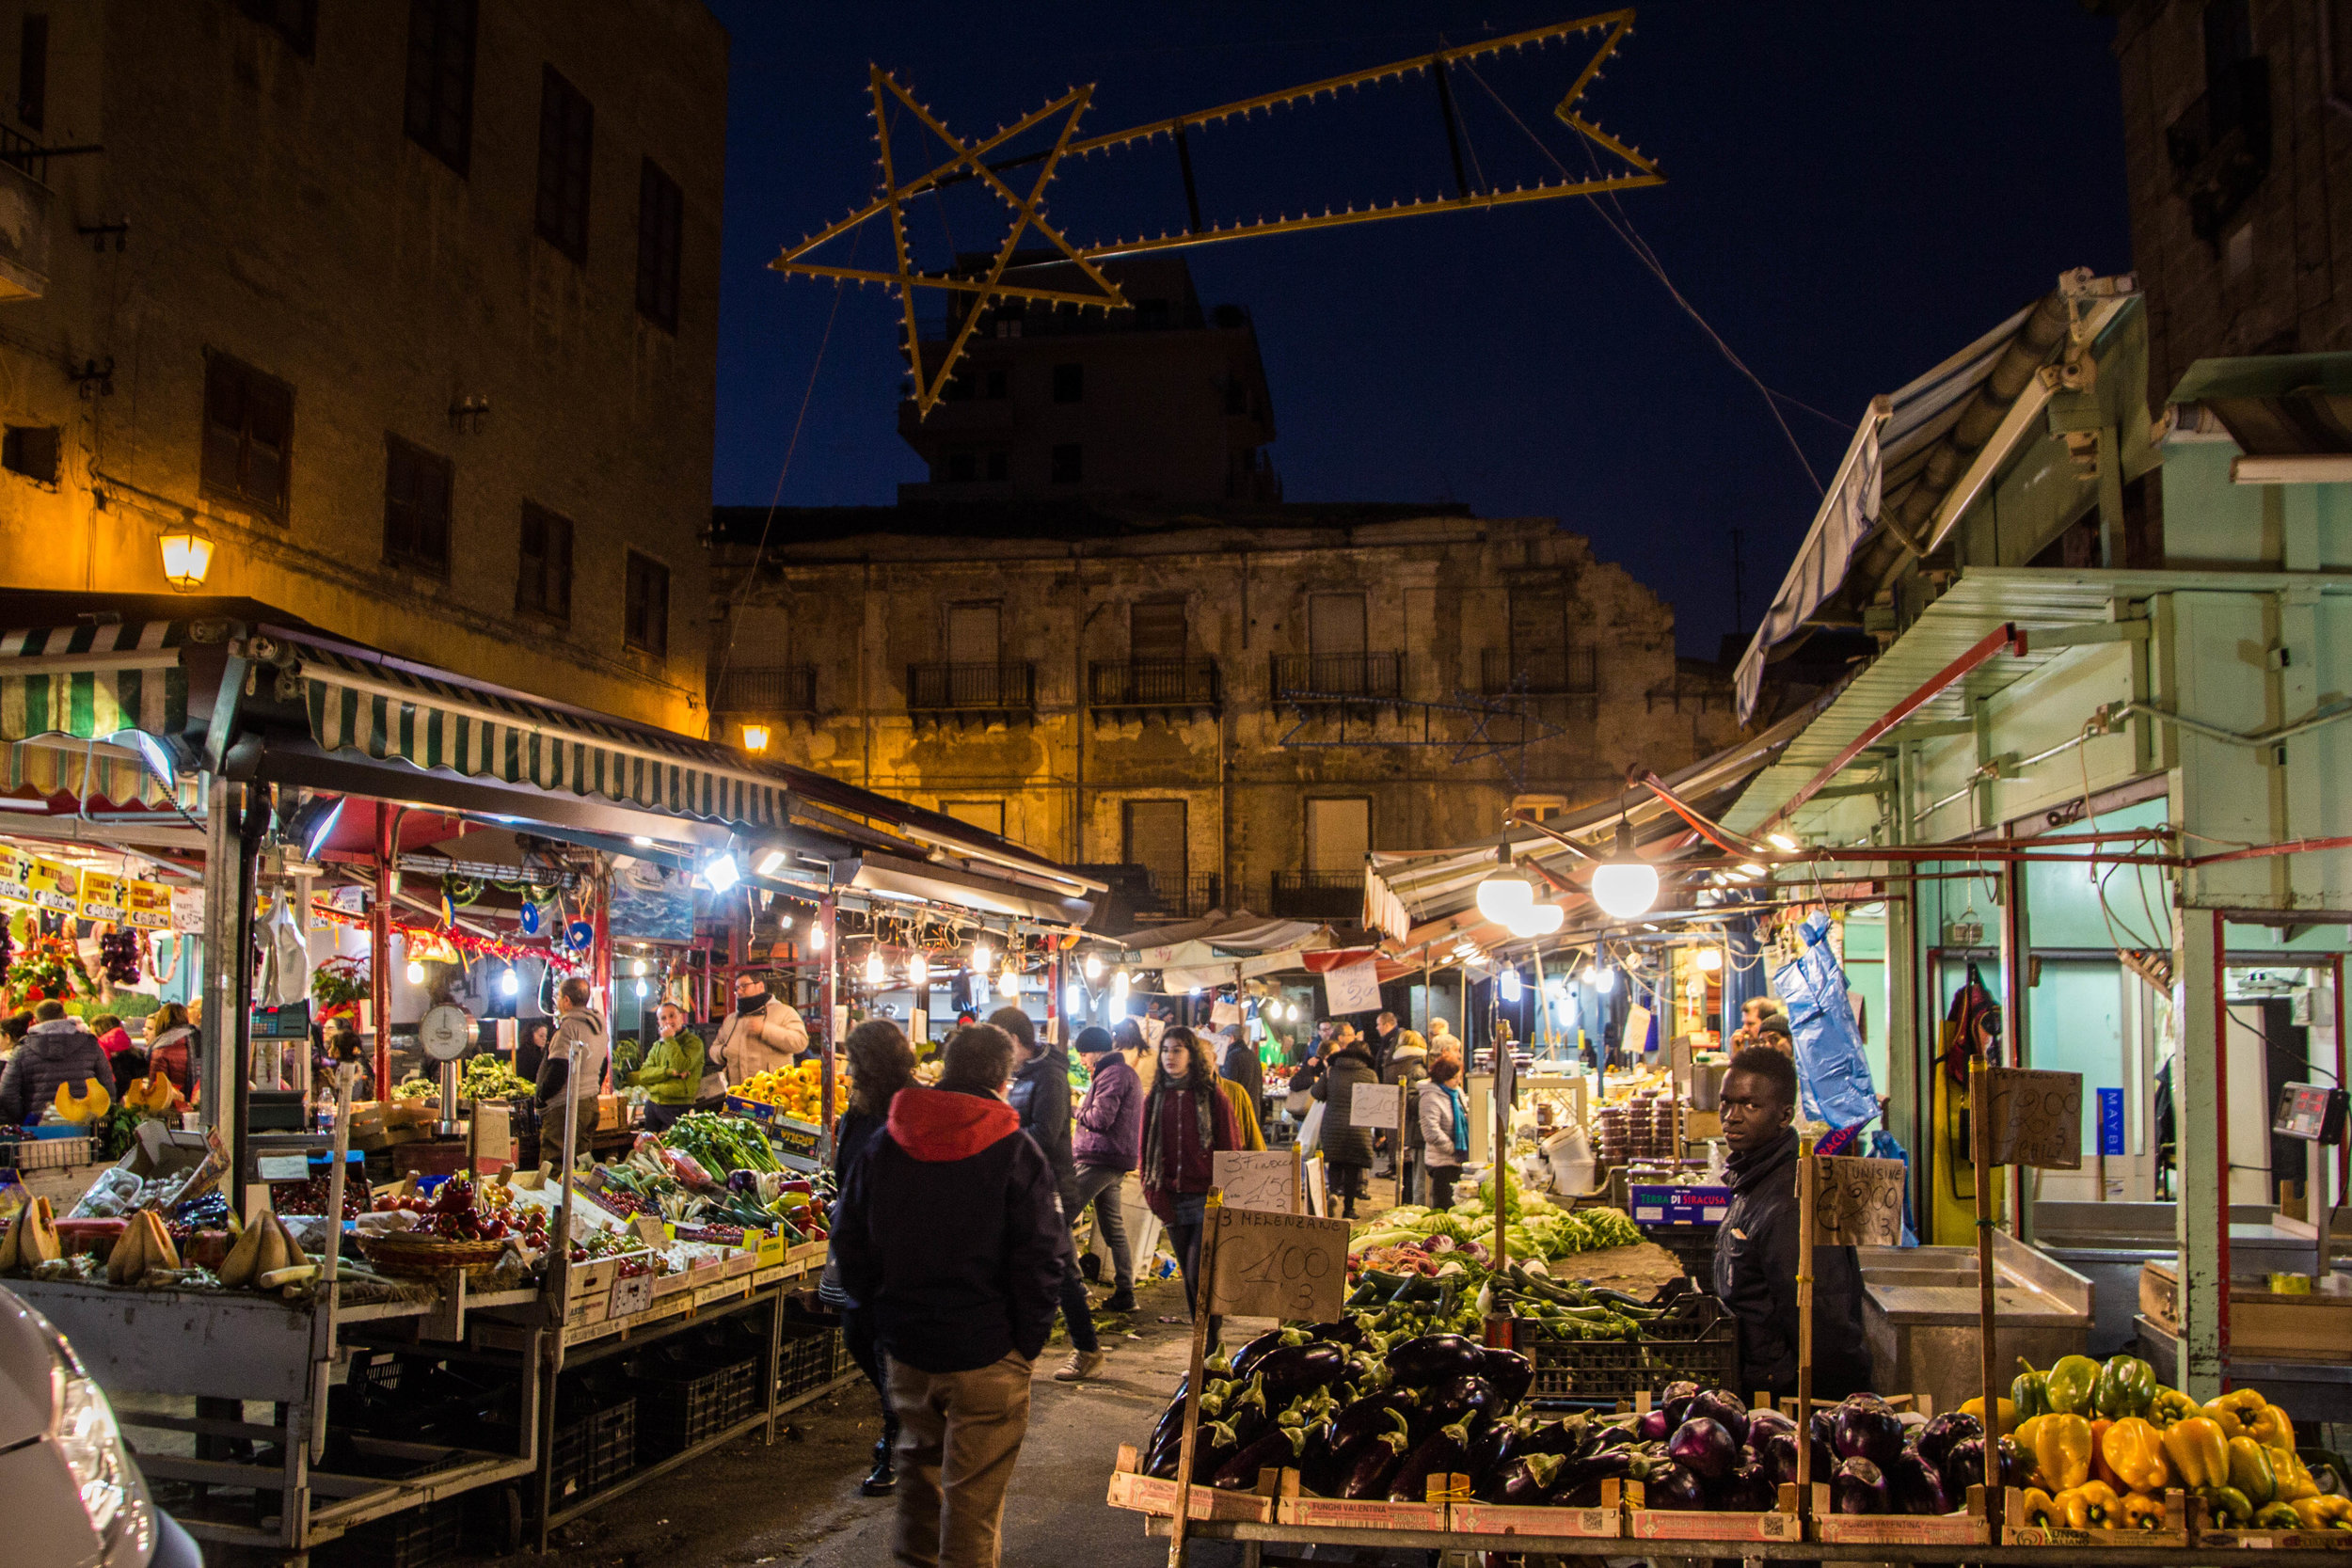 night-street-market-palermo-sicily-11.jpg